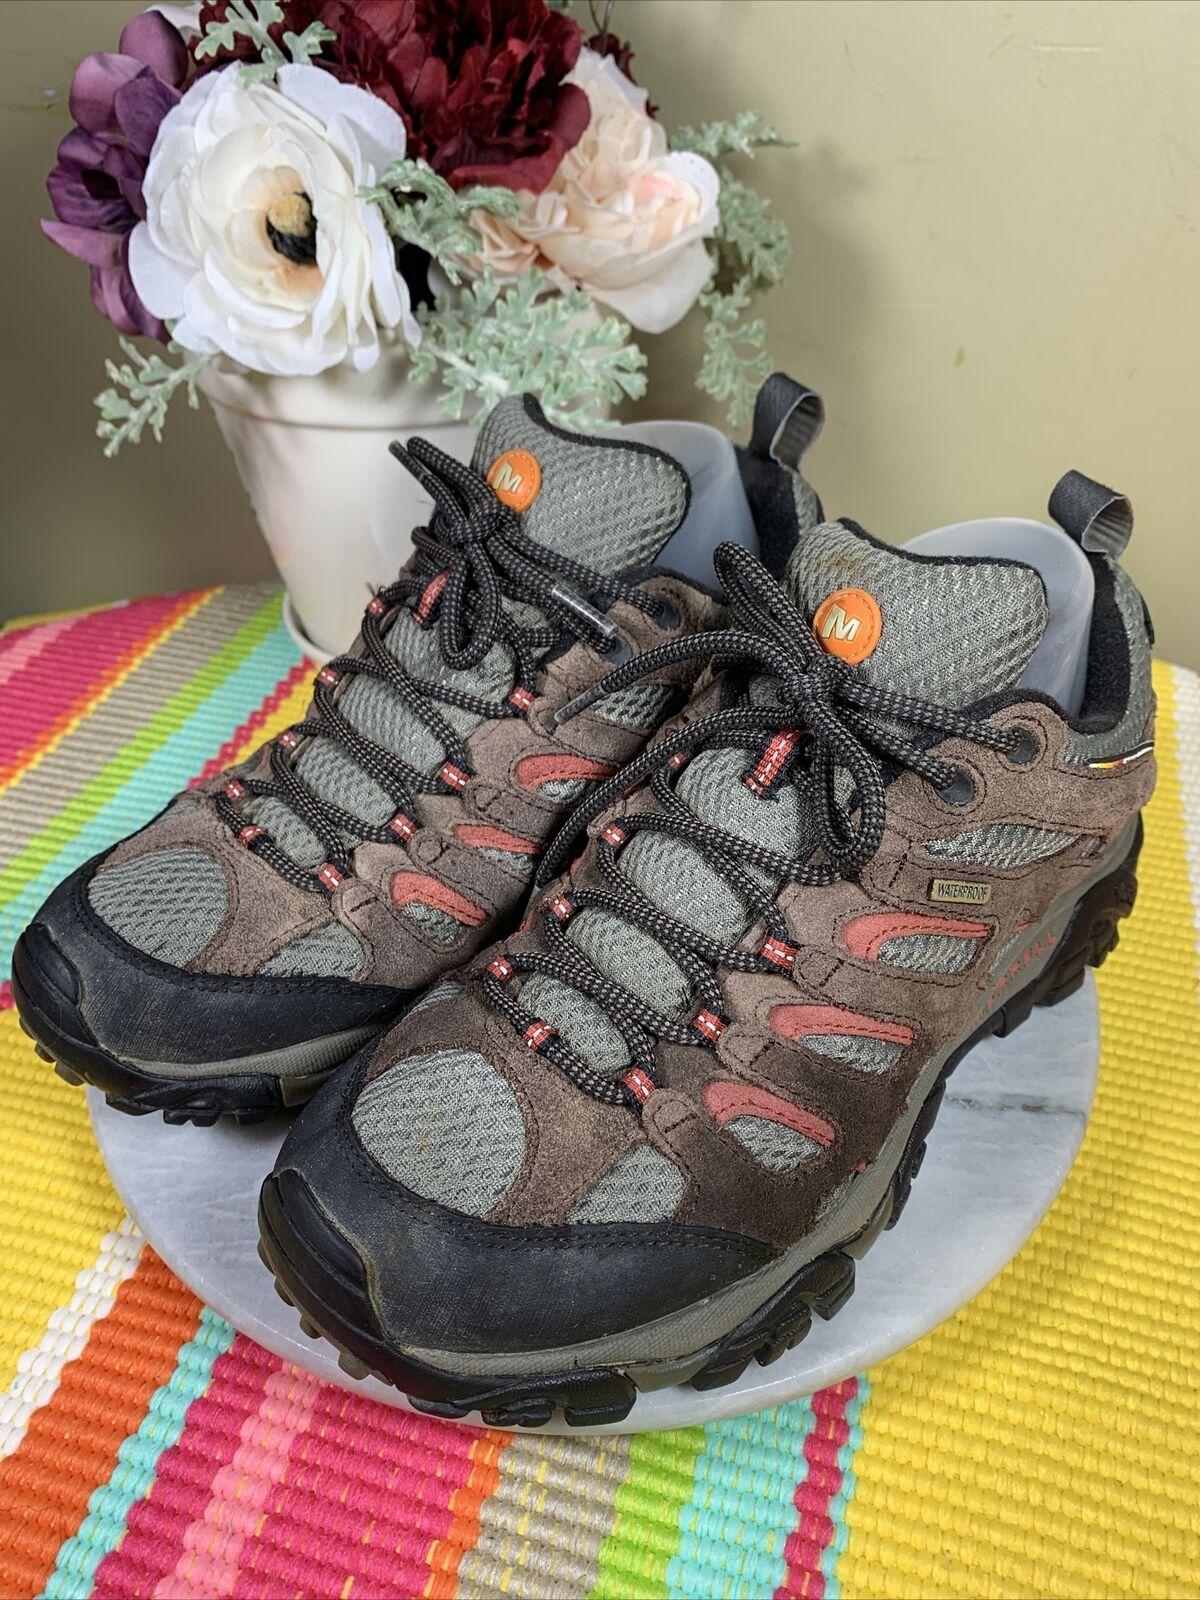 Merrell Expresso Leather Continuum Hiking Vibram Lace Shoes Men's EU 42 US 8.5 M